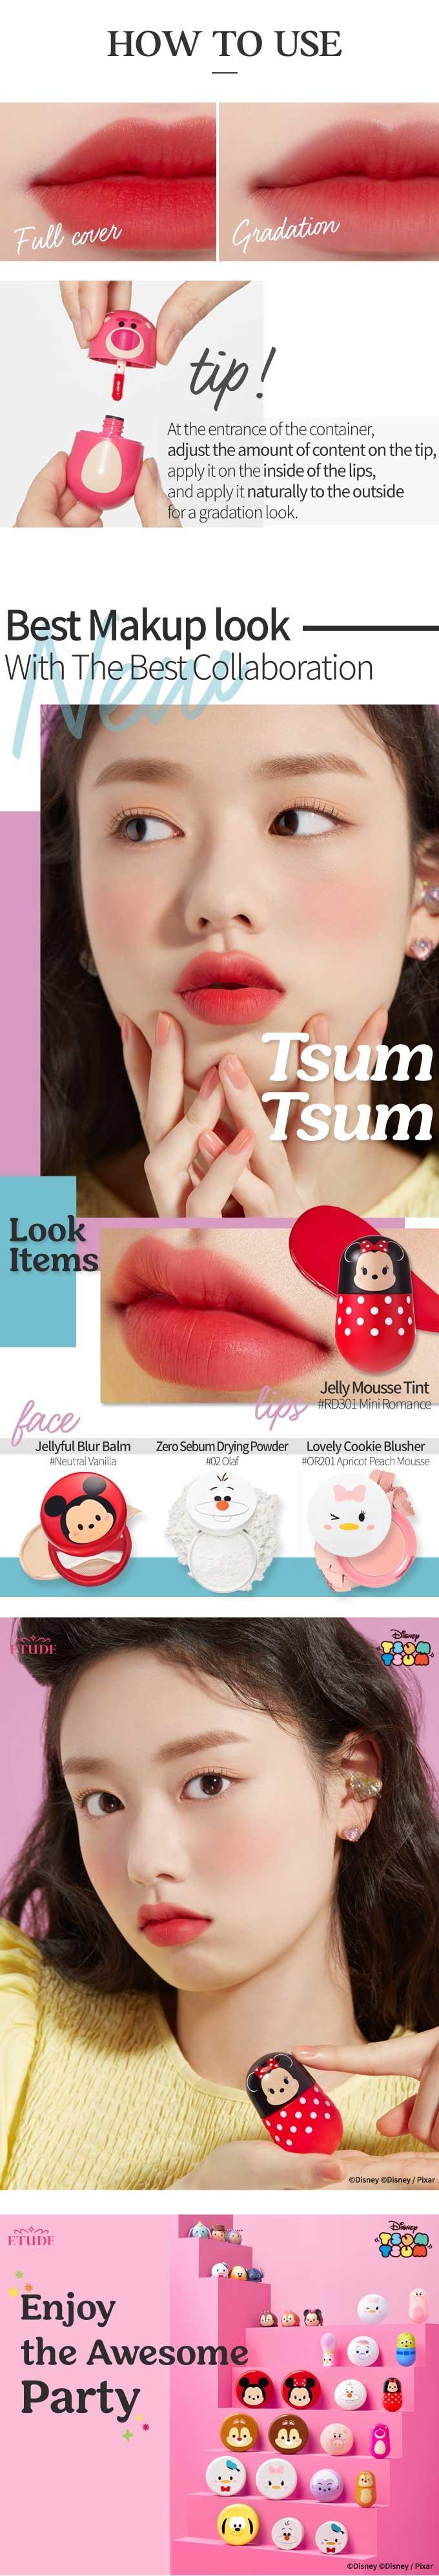 jelly-mousse-tint-3.3g-etude-house-x-disney-tsum-tsum-3.jpg